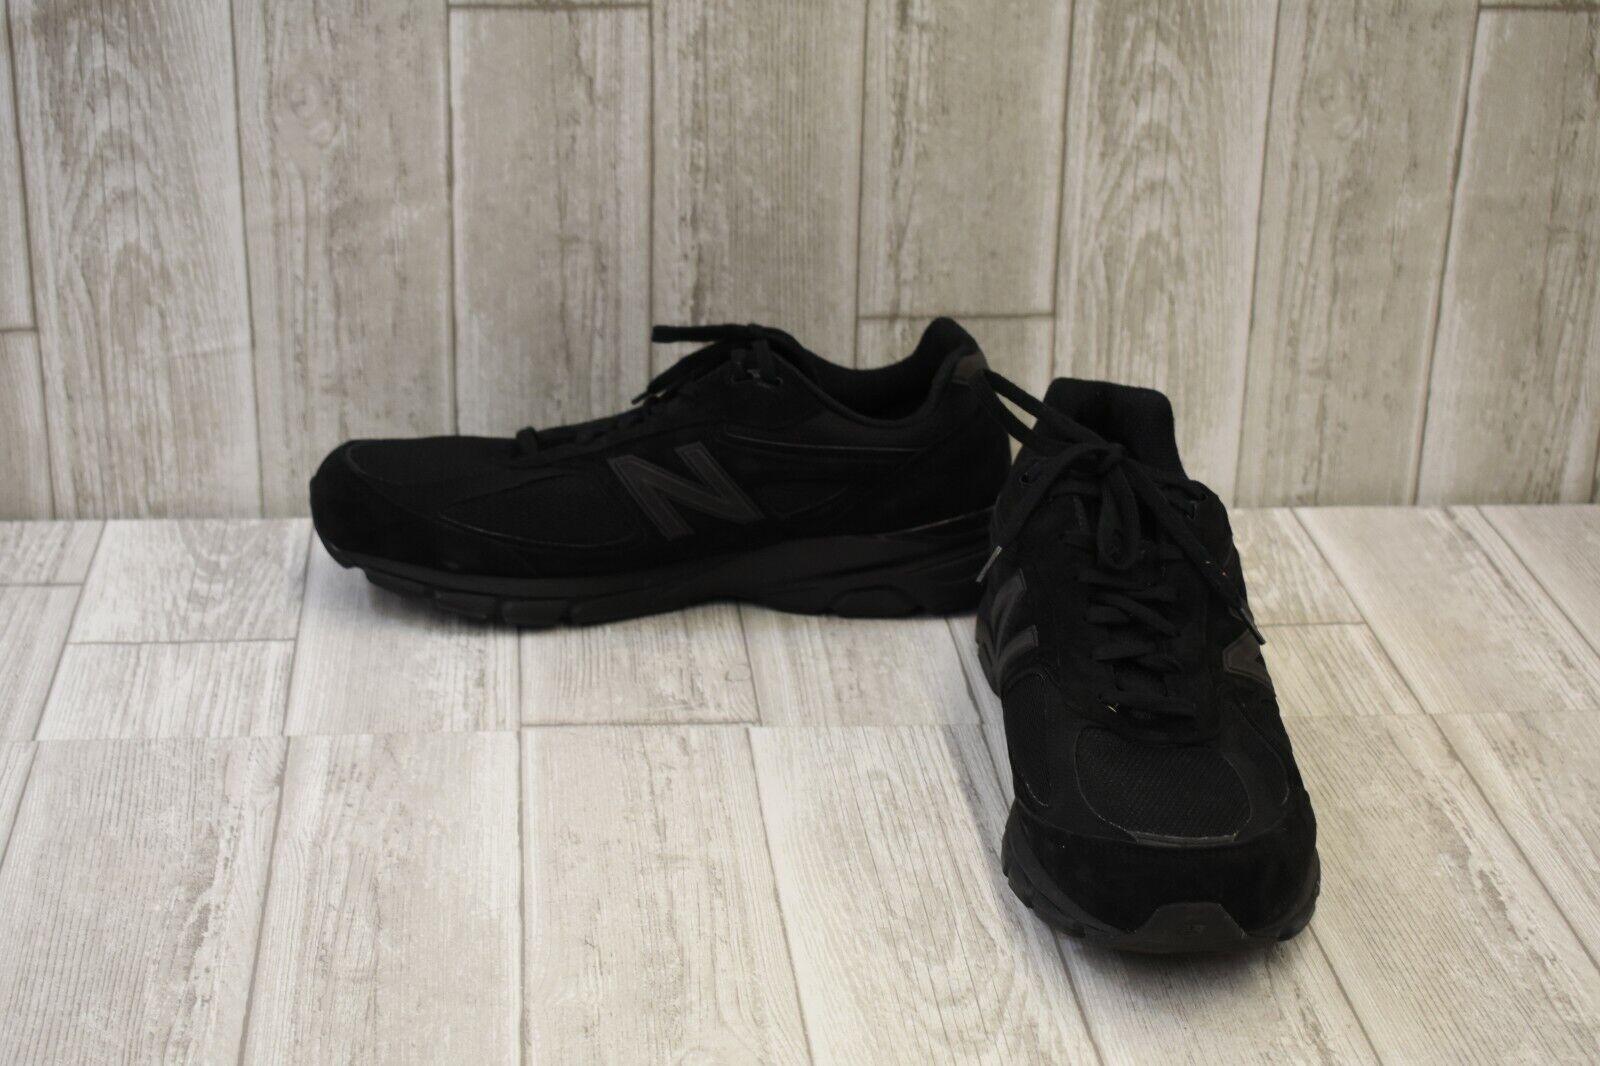 New Balance M990V4 Running shoes - Men's Size 15 (4E) - Black